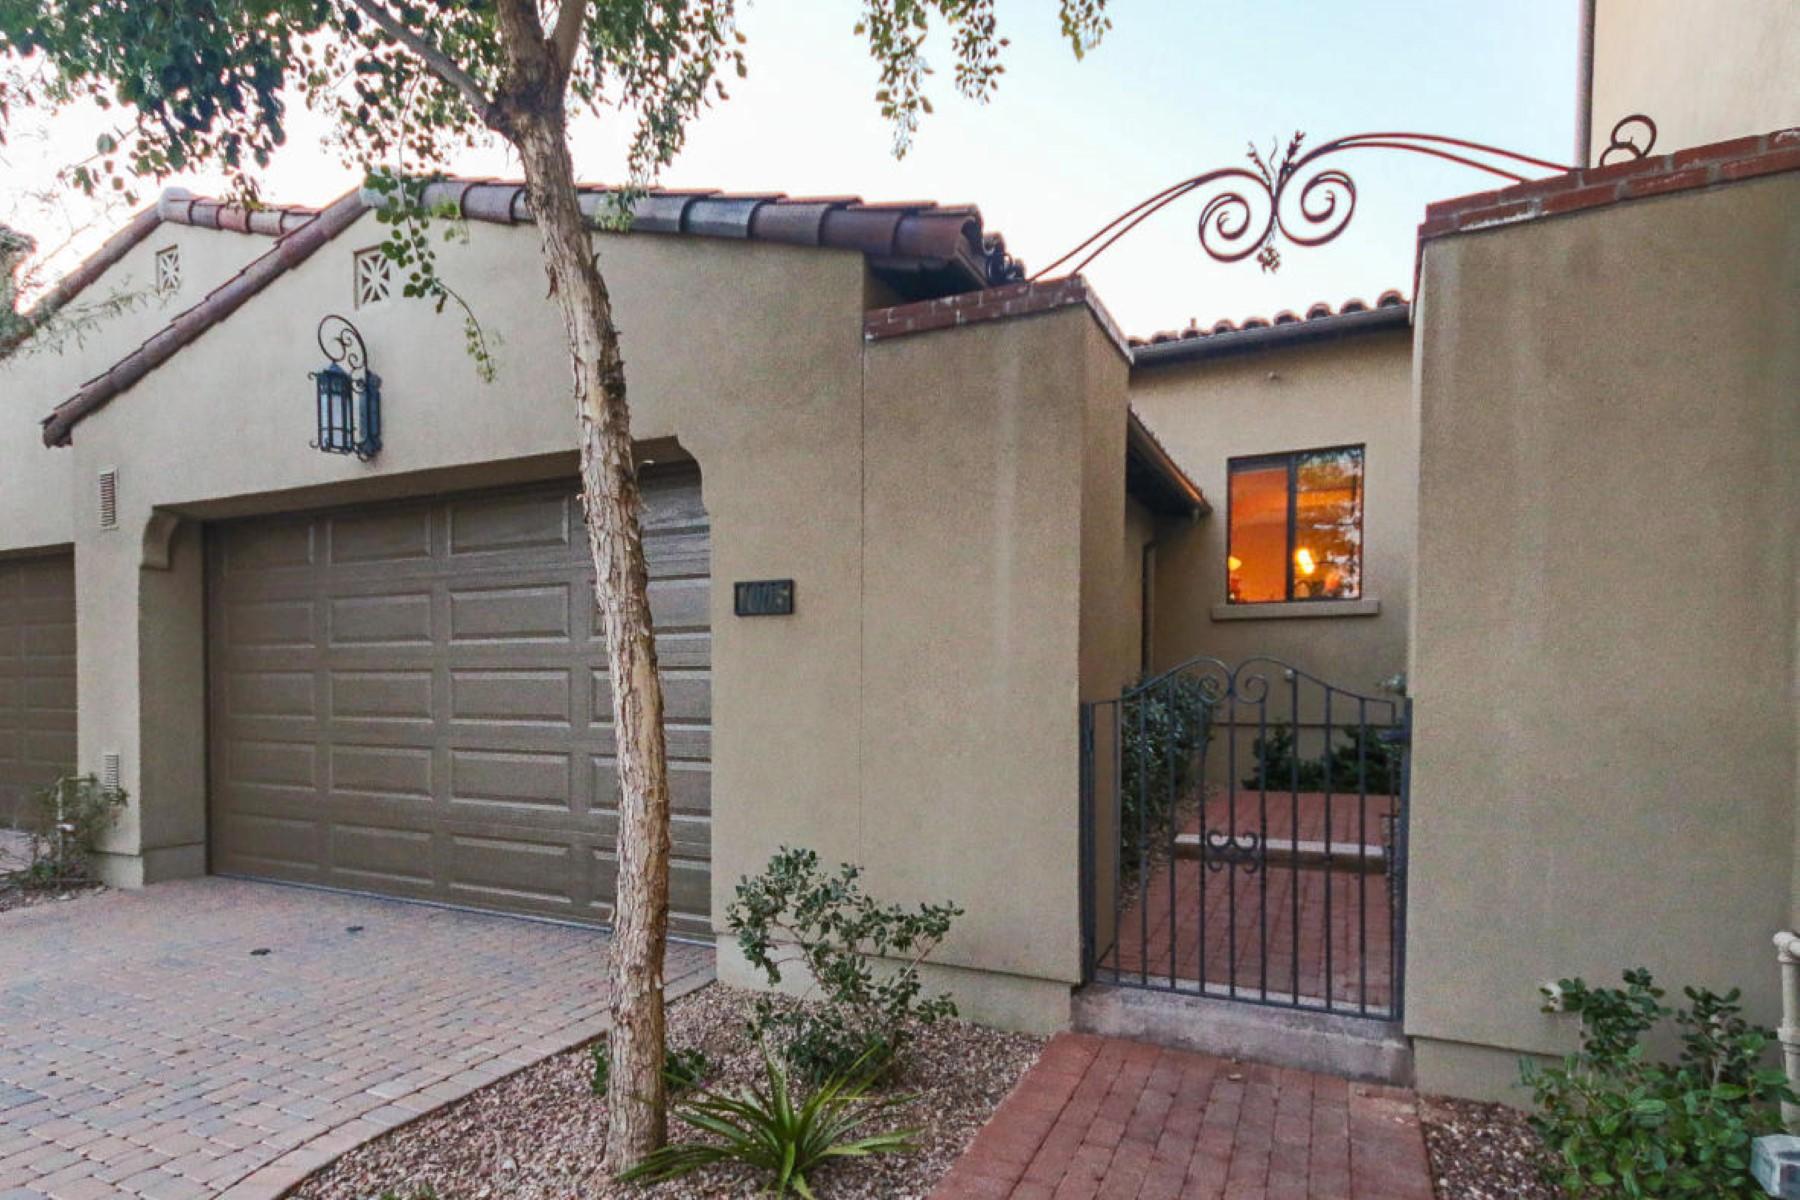 共管物業 為 出售 在 Fabulous DC Ranch Condo 18650 N Thompson Peak Pkwy #1005 Scottsdale, 亞利桑那州 85255 美國